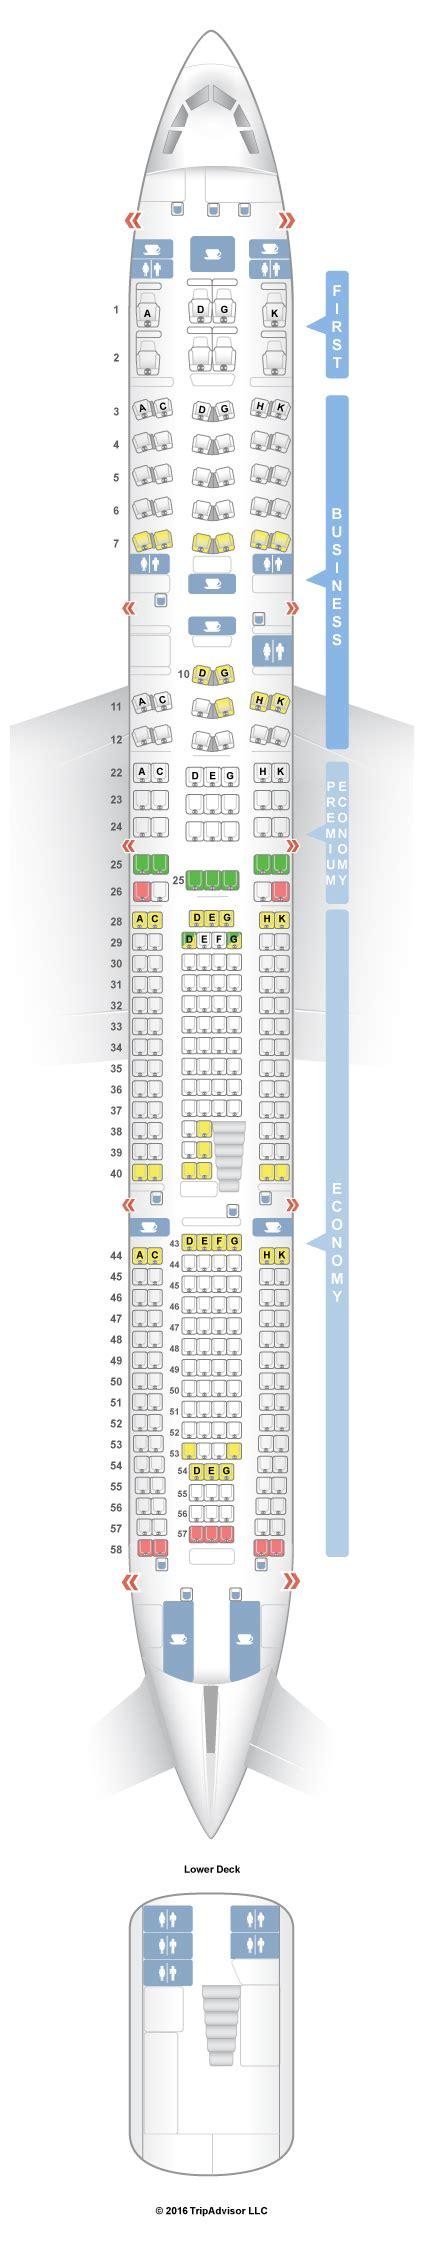 lufthansa 747 seat map seatguru seat map lufthansa airbus a340 600 346 v1